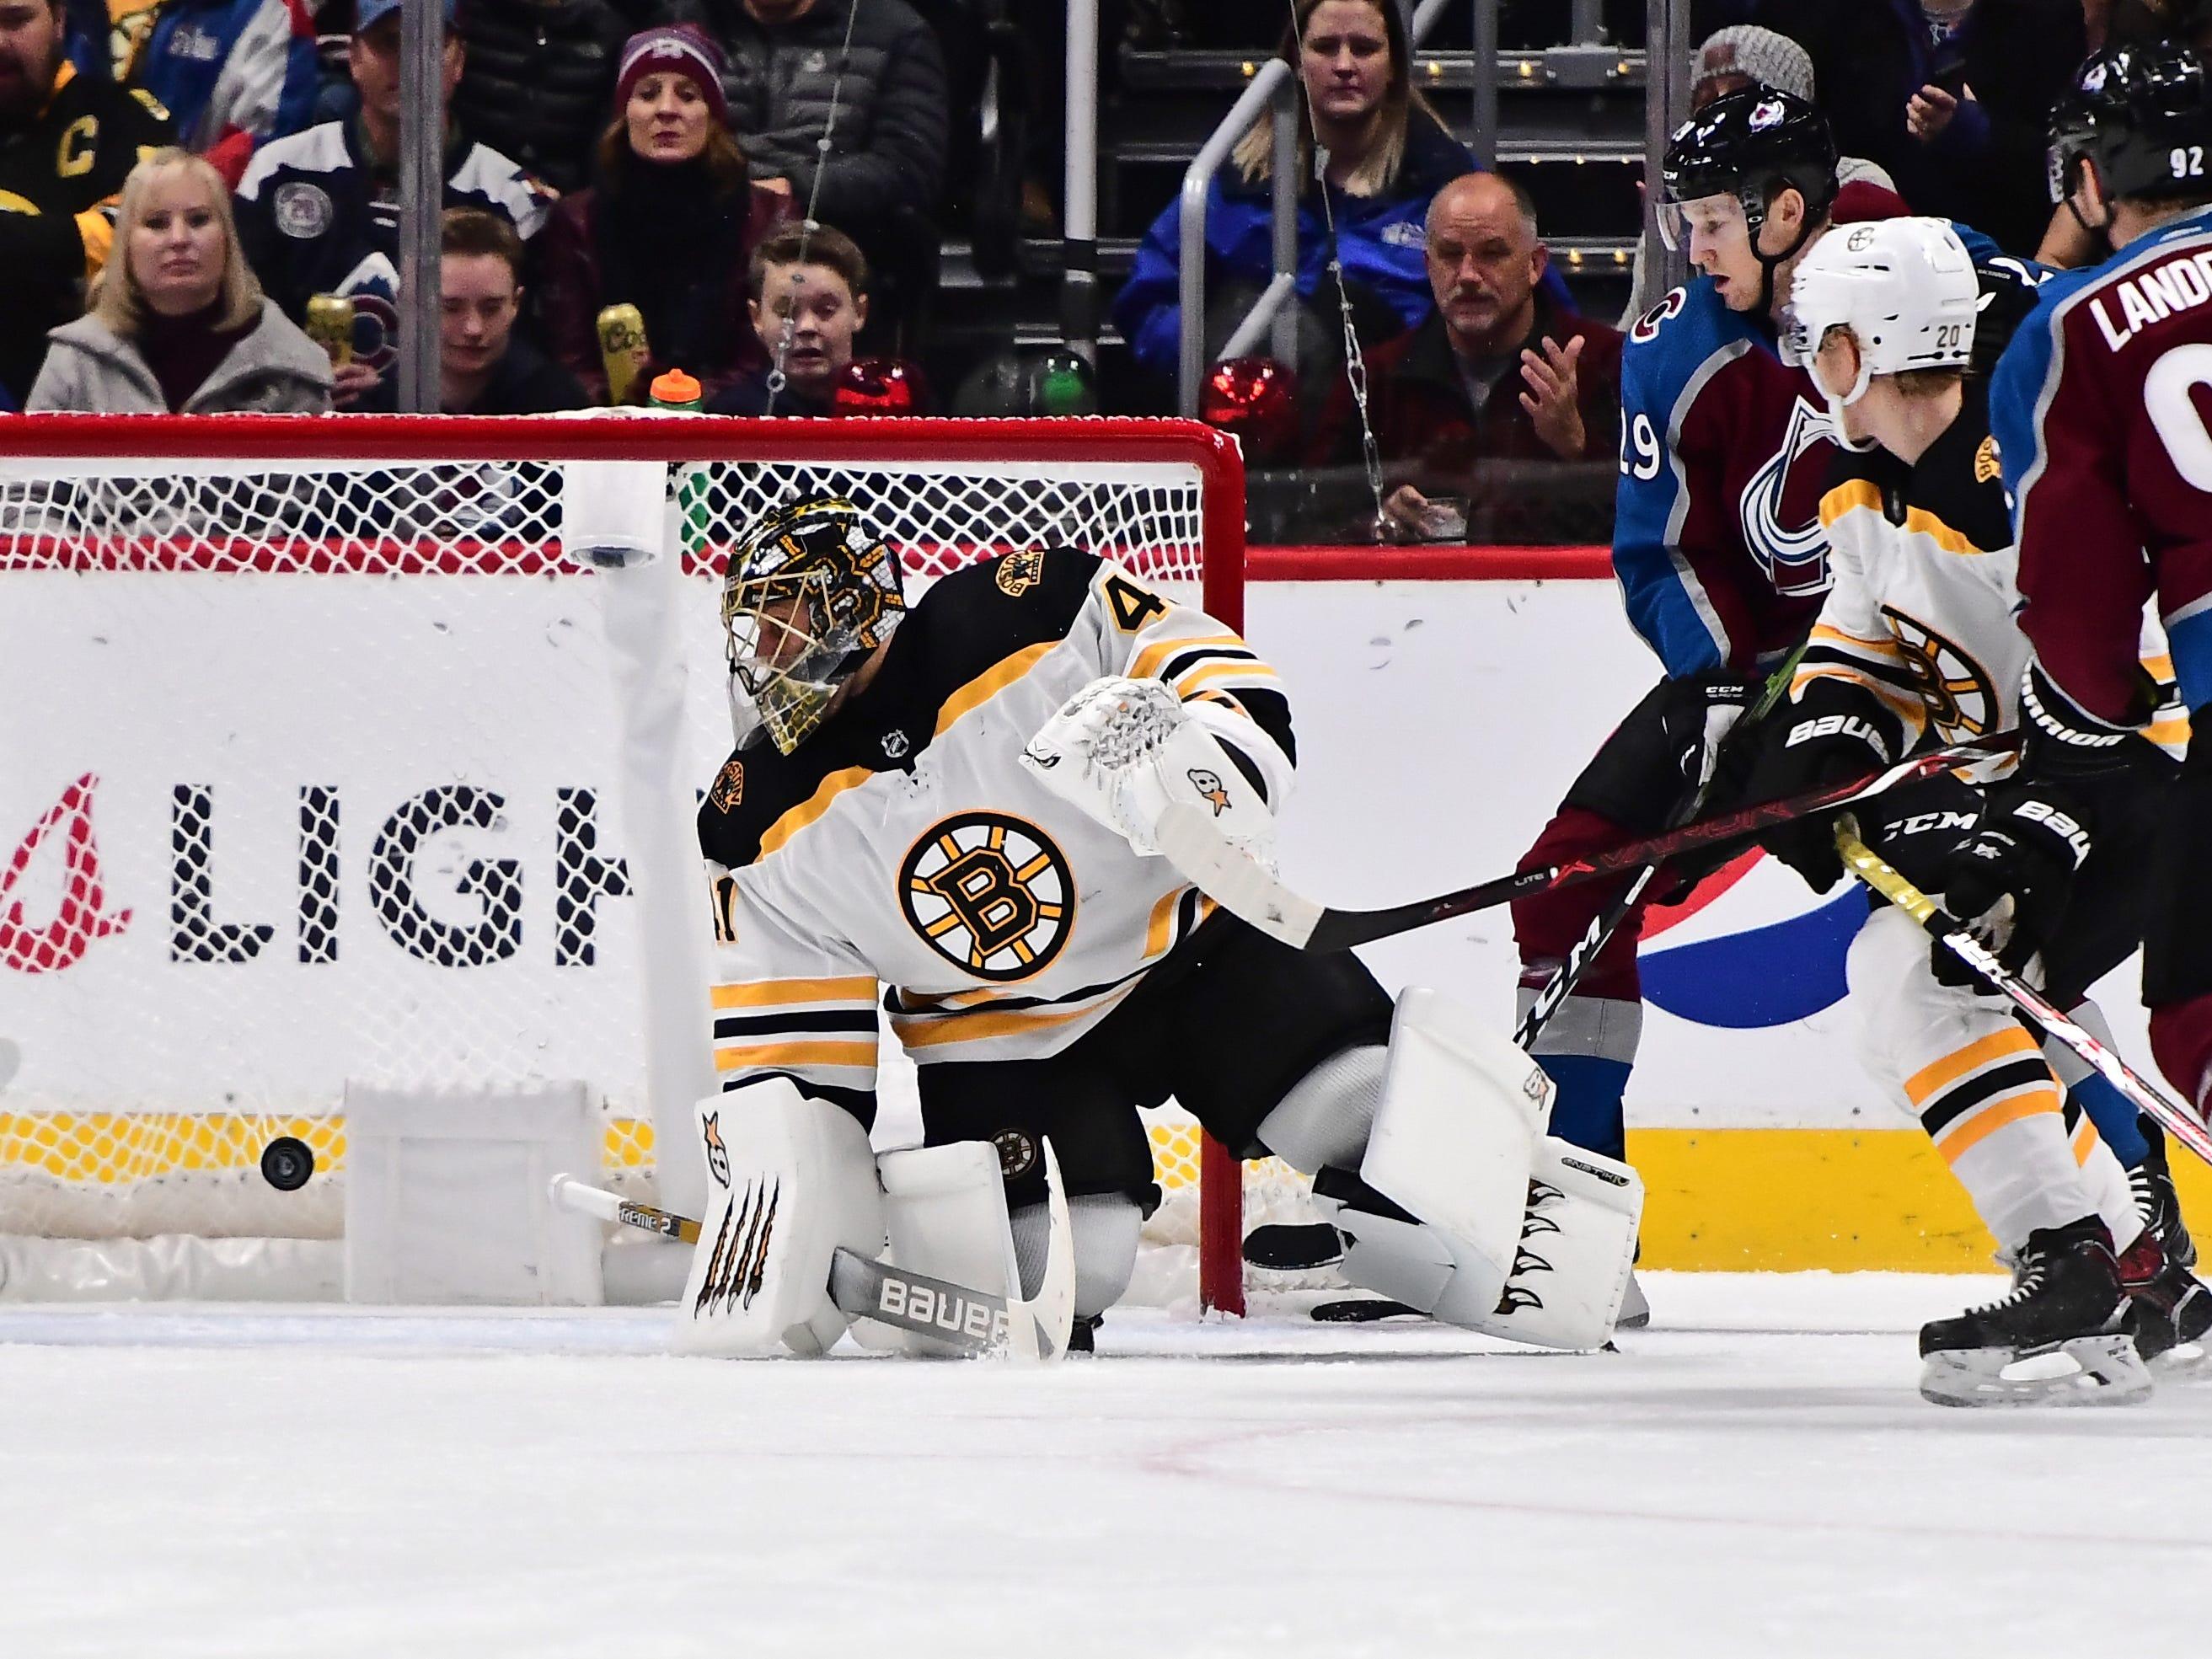 Nov. 14: Boston Bruins goaltender Jaroslav Halak watches as Colorado Avalanche captain Gabriel Landeskog's shot goes into the net.